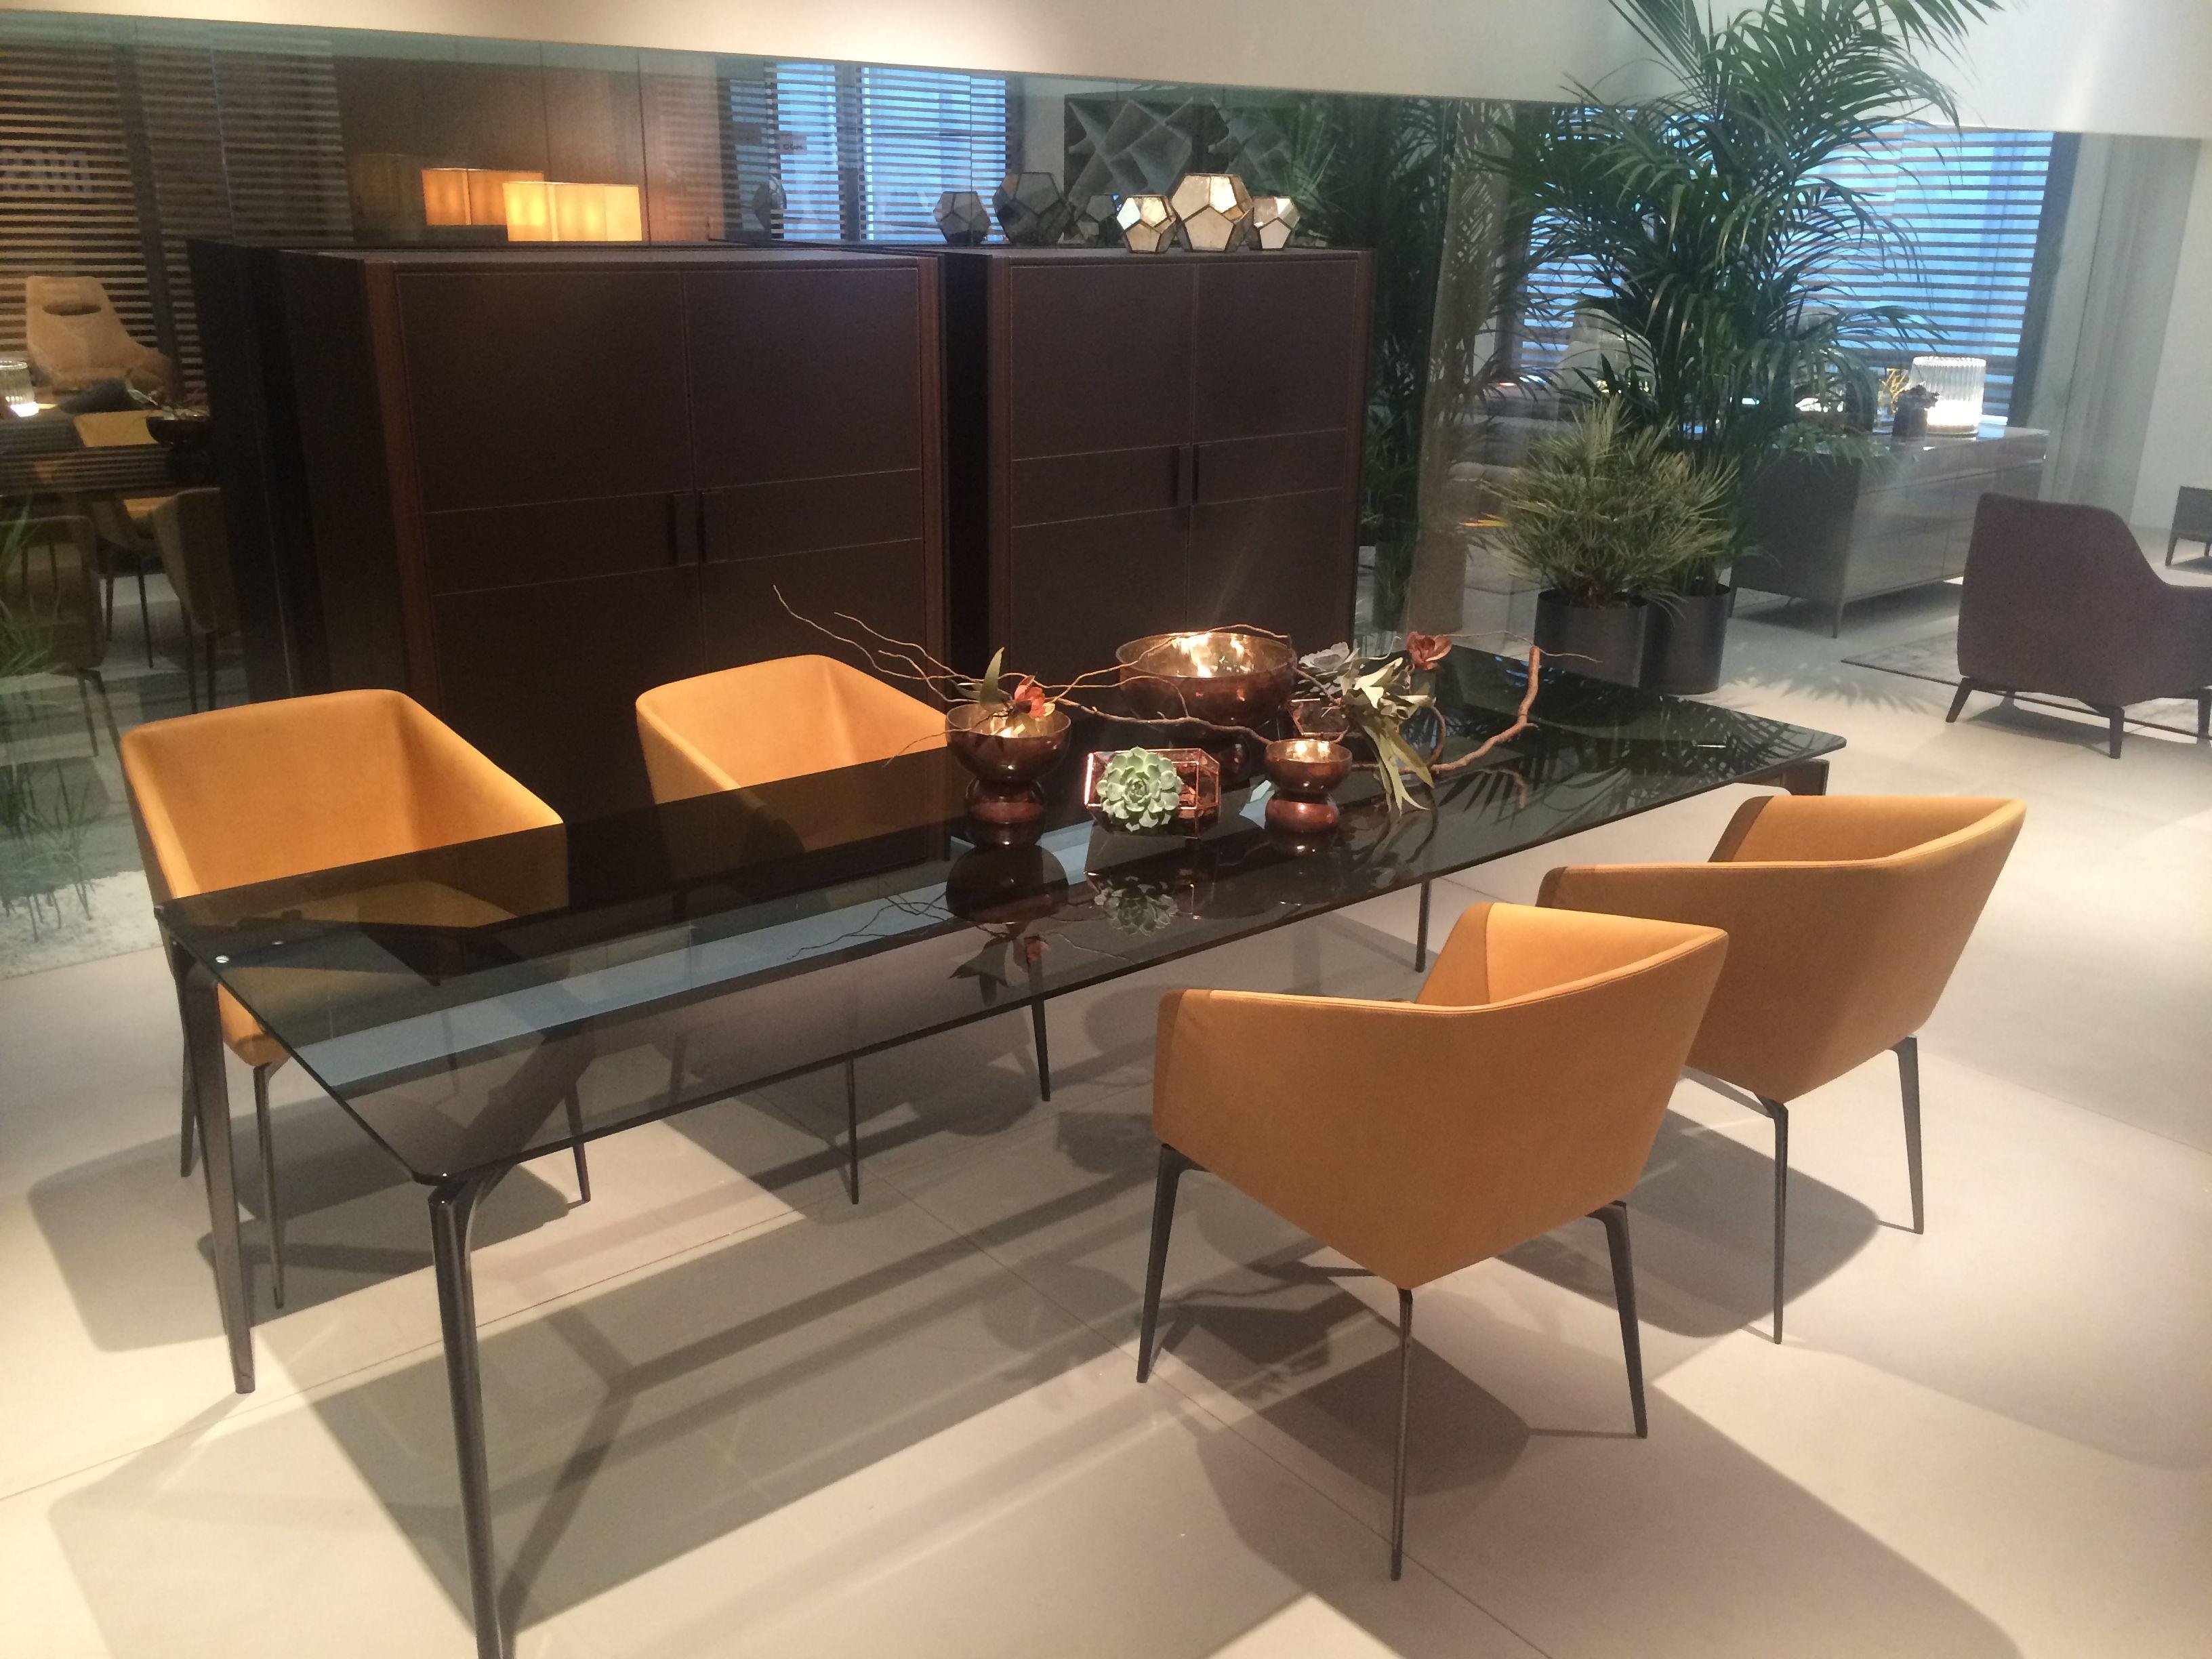 alivar designer inneneinrichtung, alivar salone del mobile 2015 | alivar | pinterest, Design ideen